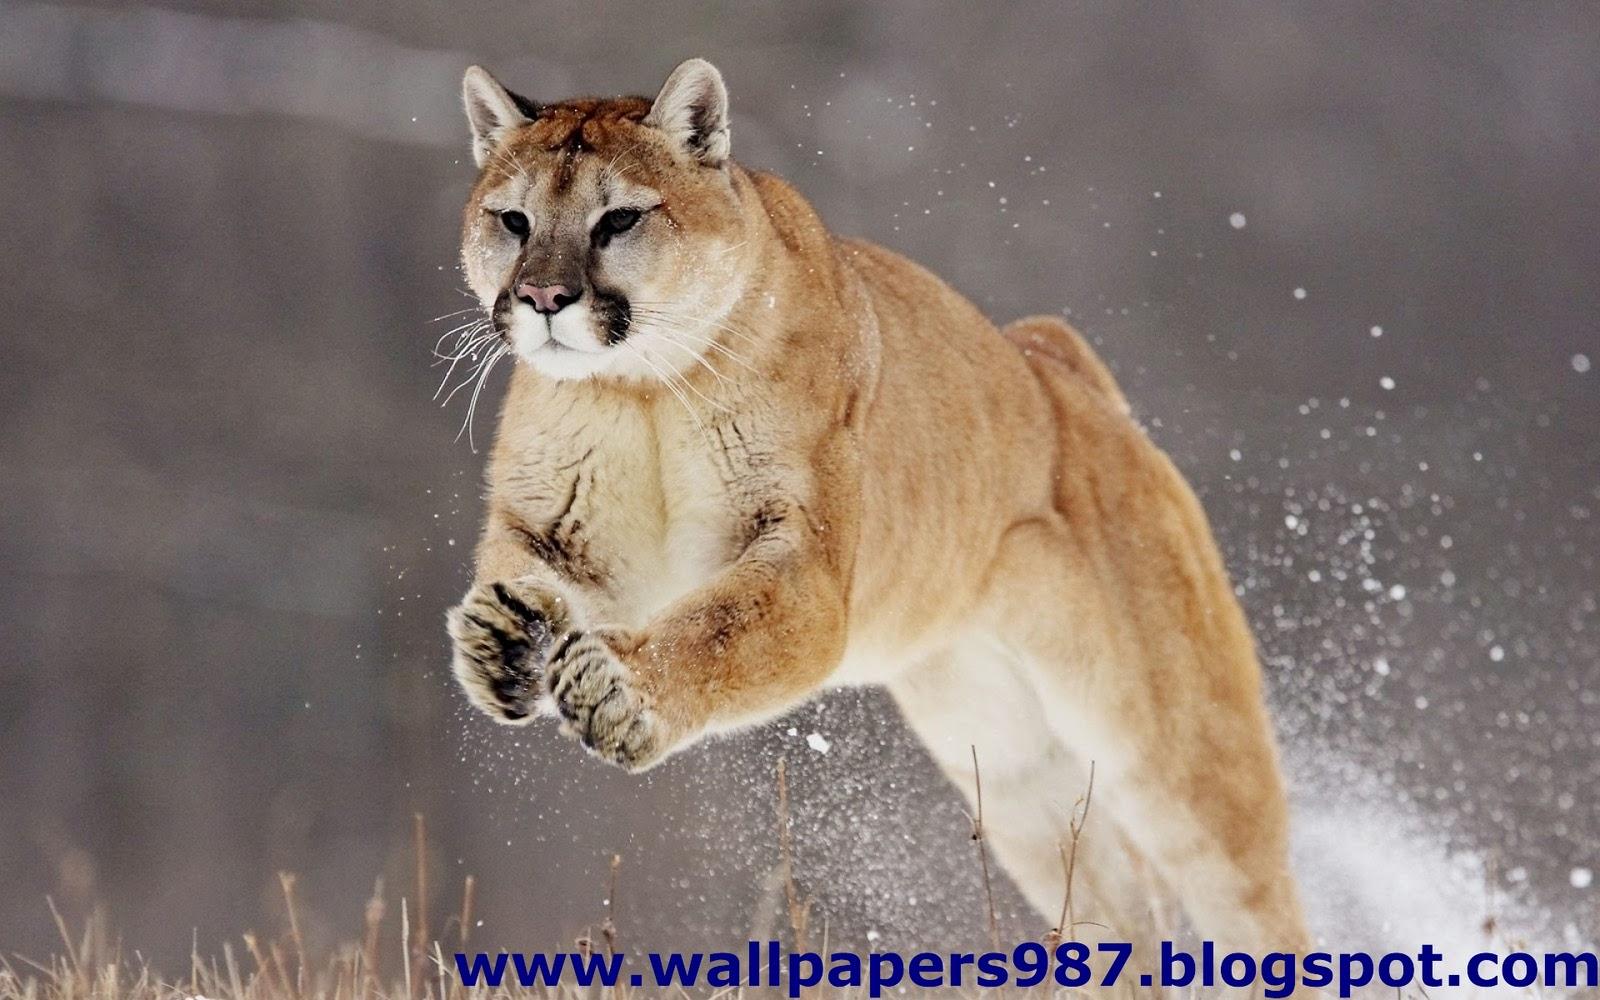 http://3.bp.blogspot.com/_SOSNZoTv8ng/TQYW7HMFQzI/AAAAAAAAAHc/cBW_1Z1tL3k/s1600/windows_masaustu_arka_plan_resimleri_vahsi_kediler_aslan_kaplan_HD_HQ_Full_Animal.+Pic+%2528145%2529.jpg